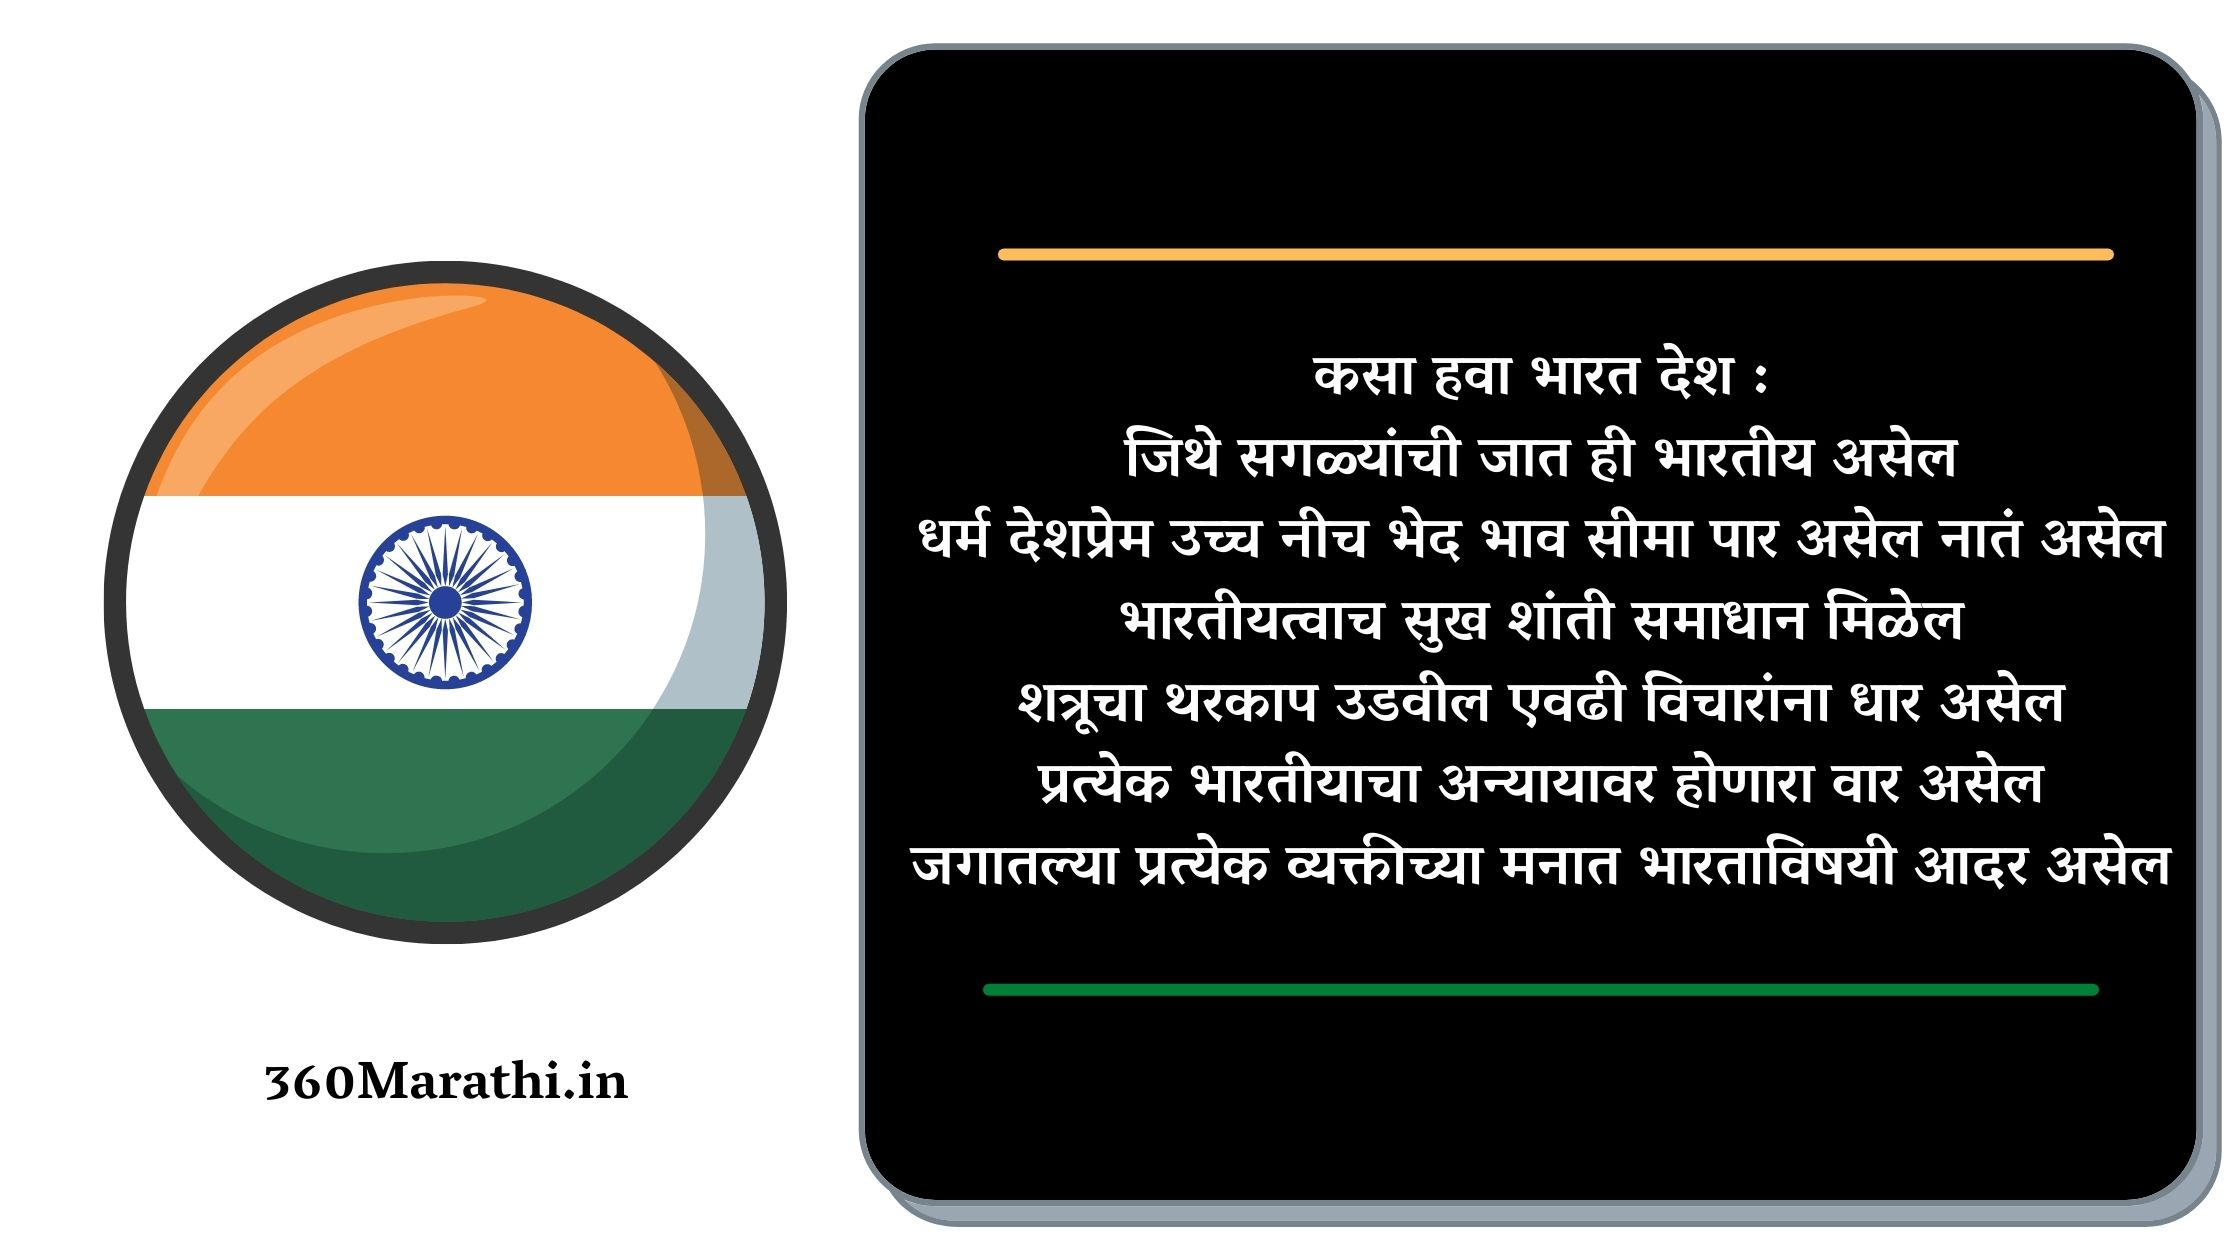 Kargil Vijay Diwas Poem in Marathi | कारगिल विजय दिवस कविता मराठी